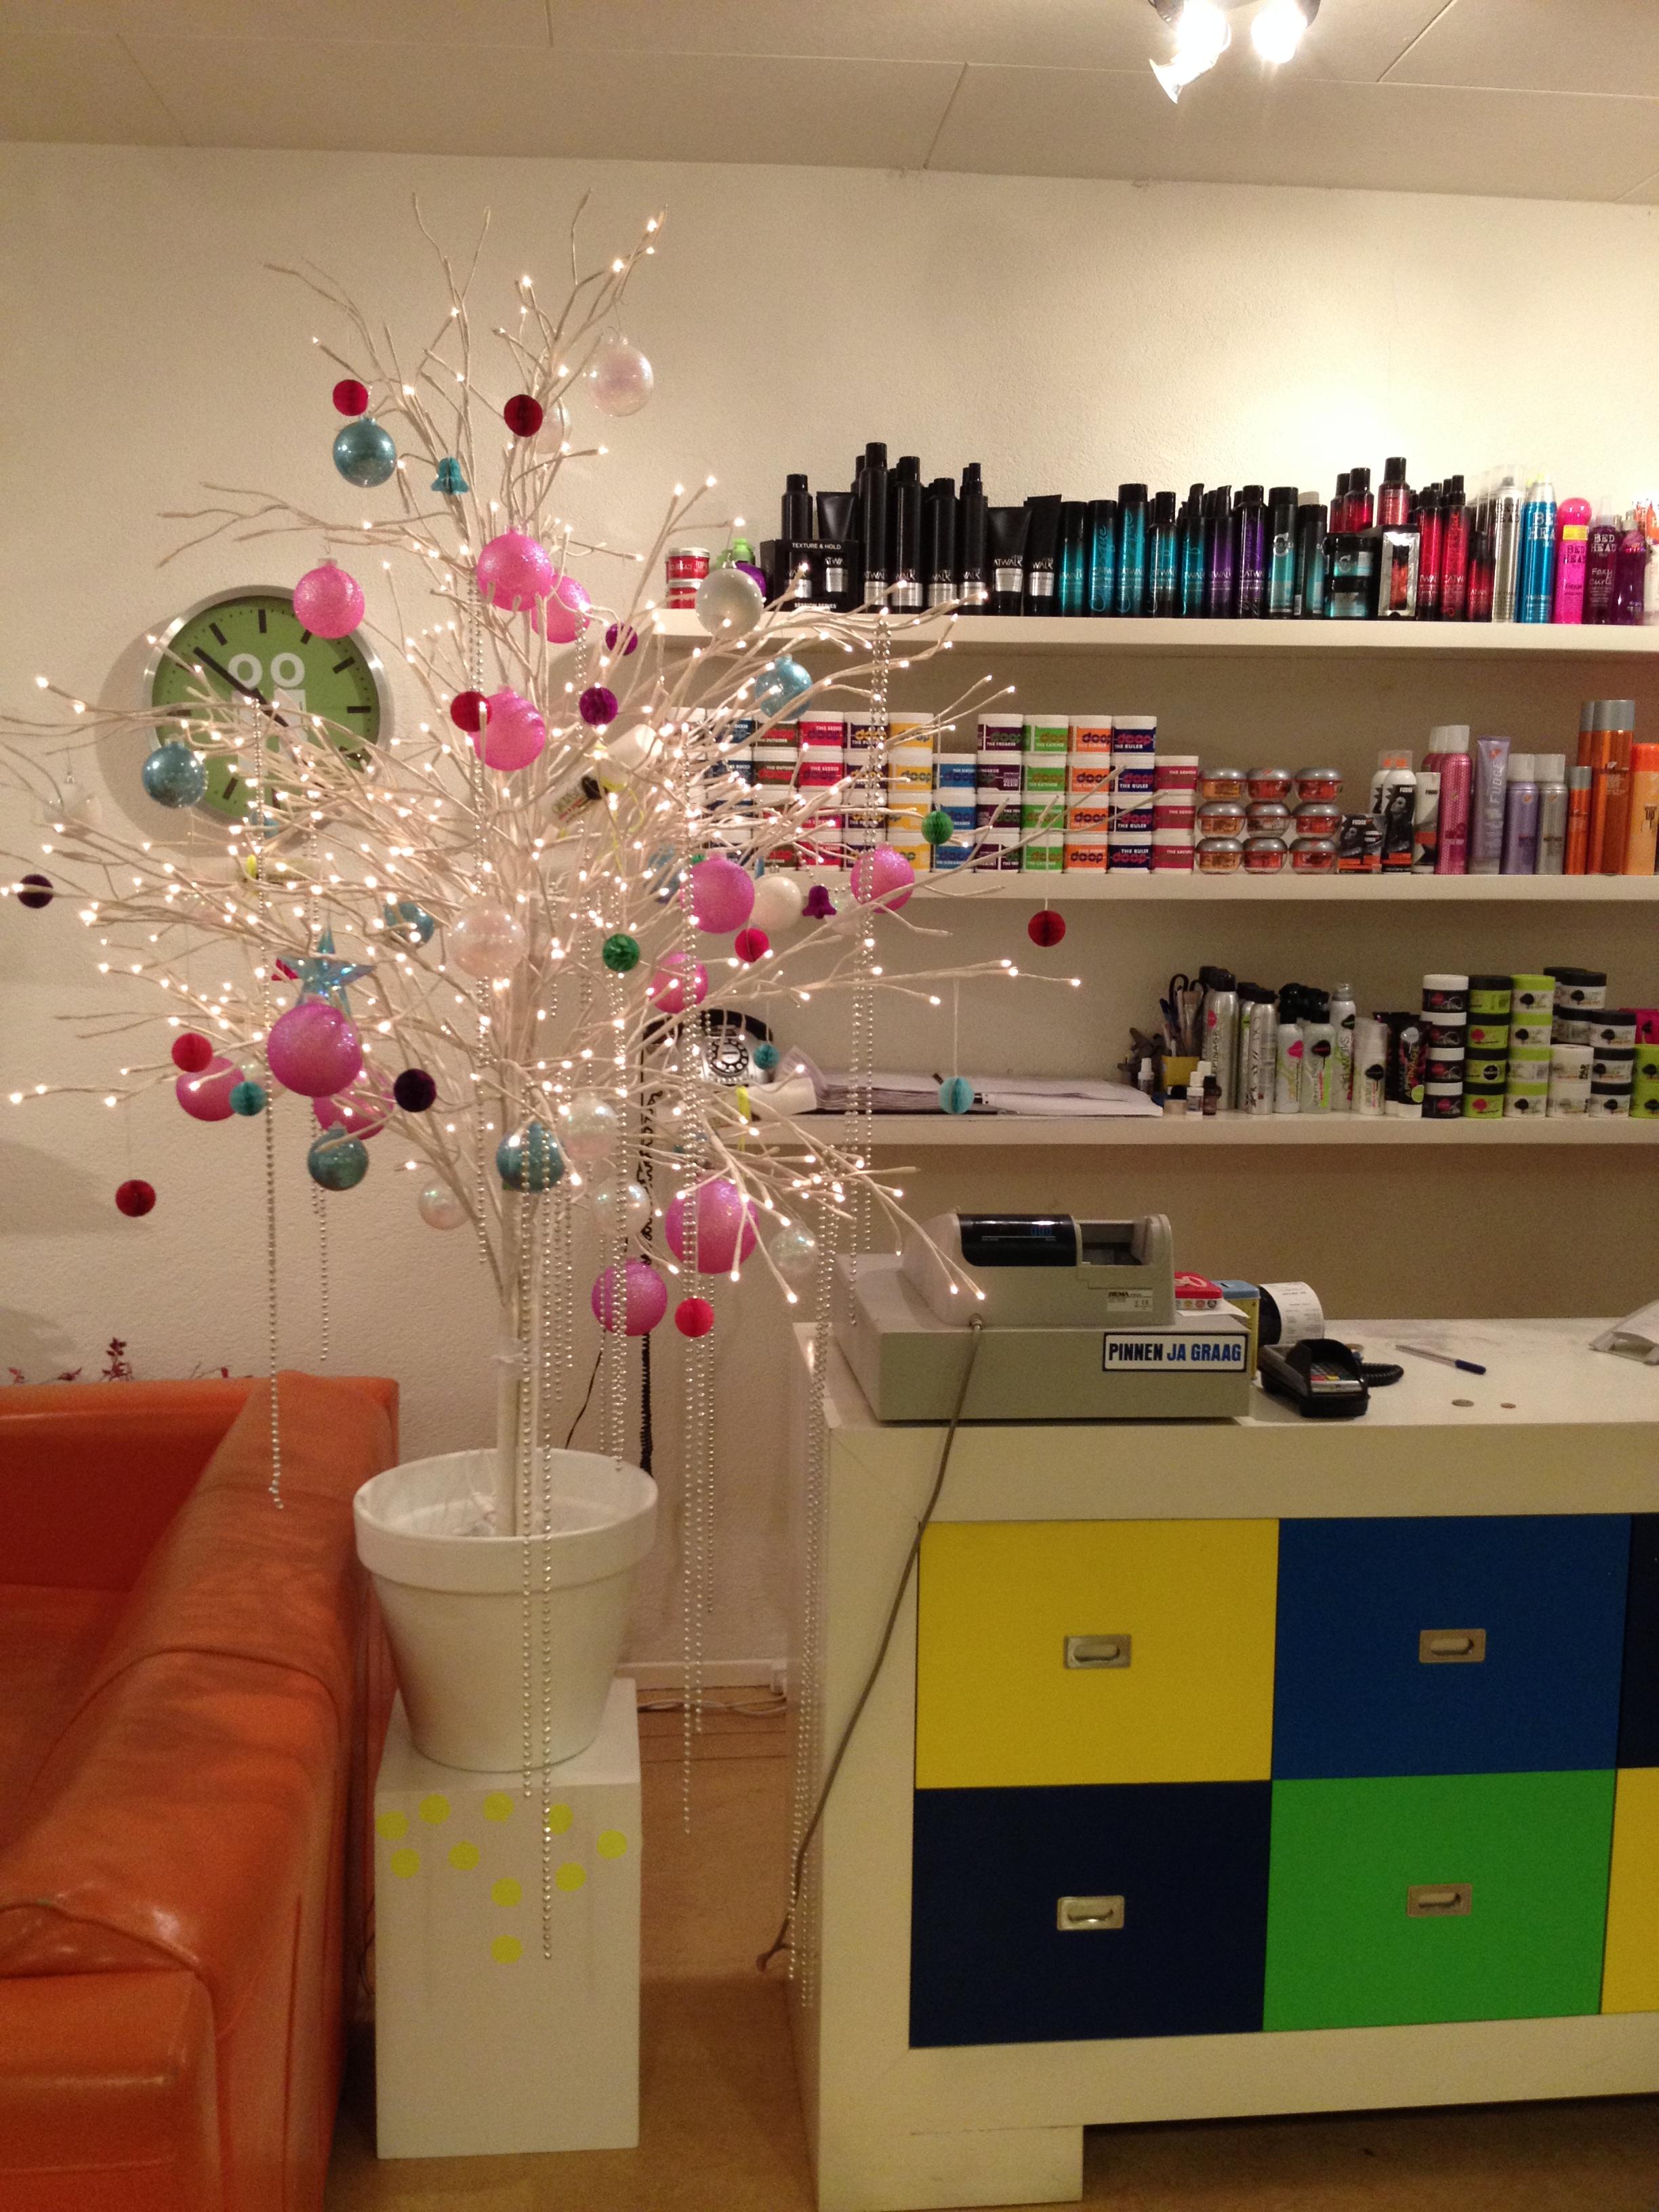 Verhuur decoratie rich art design etaleur etalage - Decoratie epuree salon ...